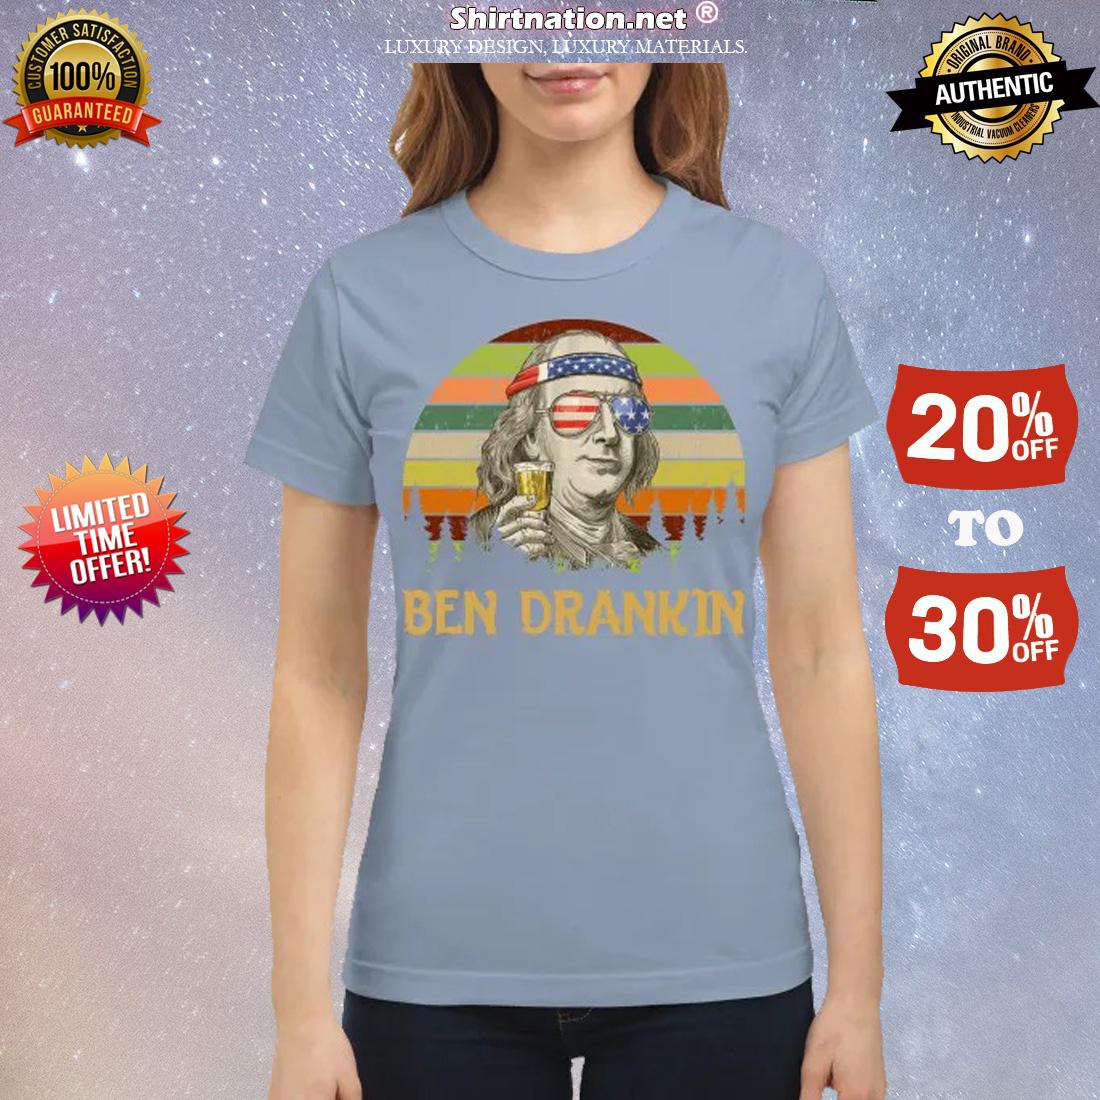 Ben Drankin classic shirt